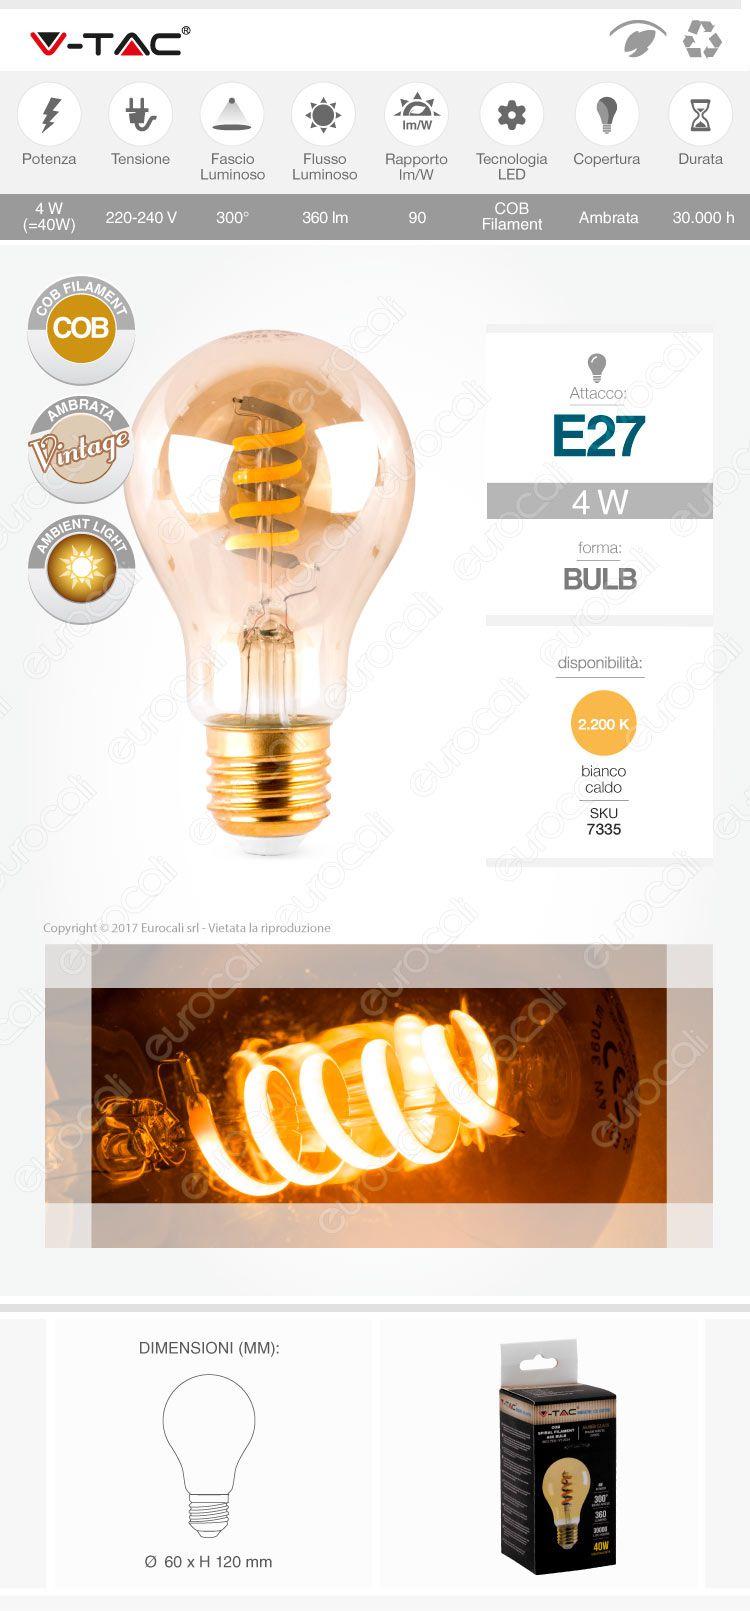 v-tac Lampadina LED E27 amber cob filament